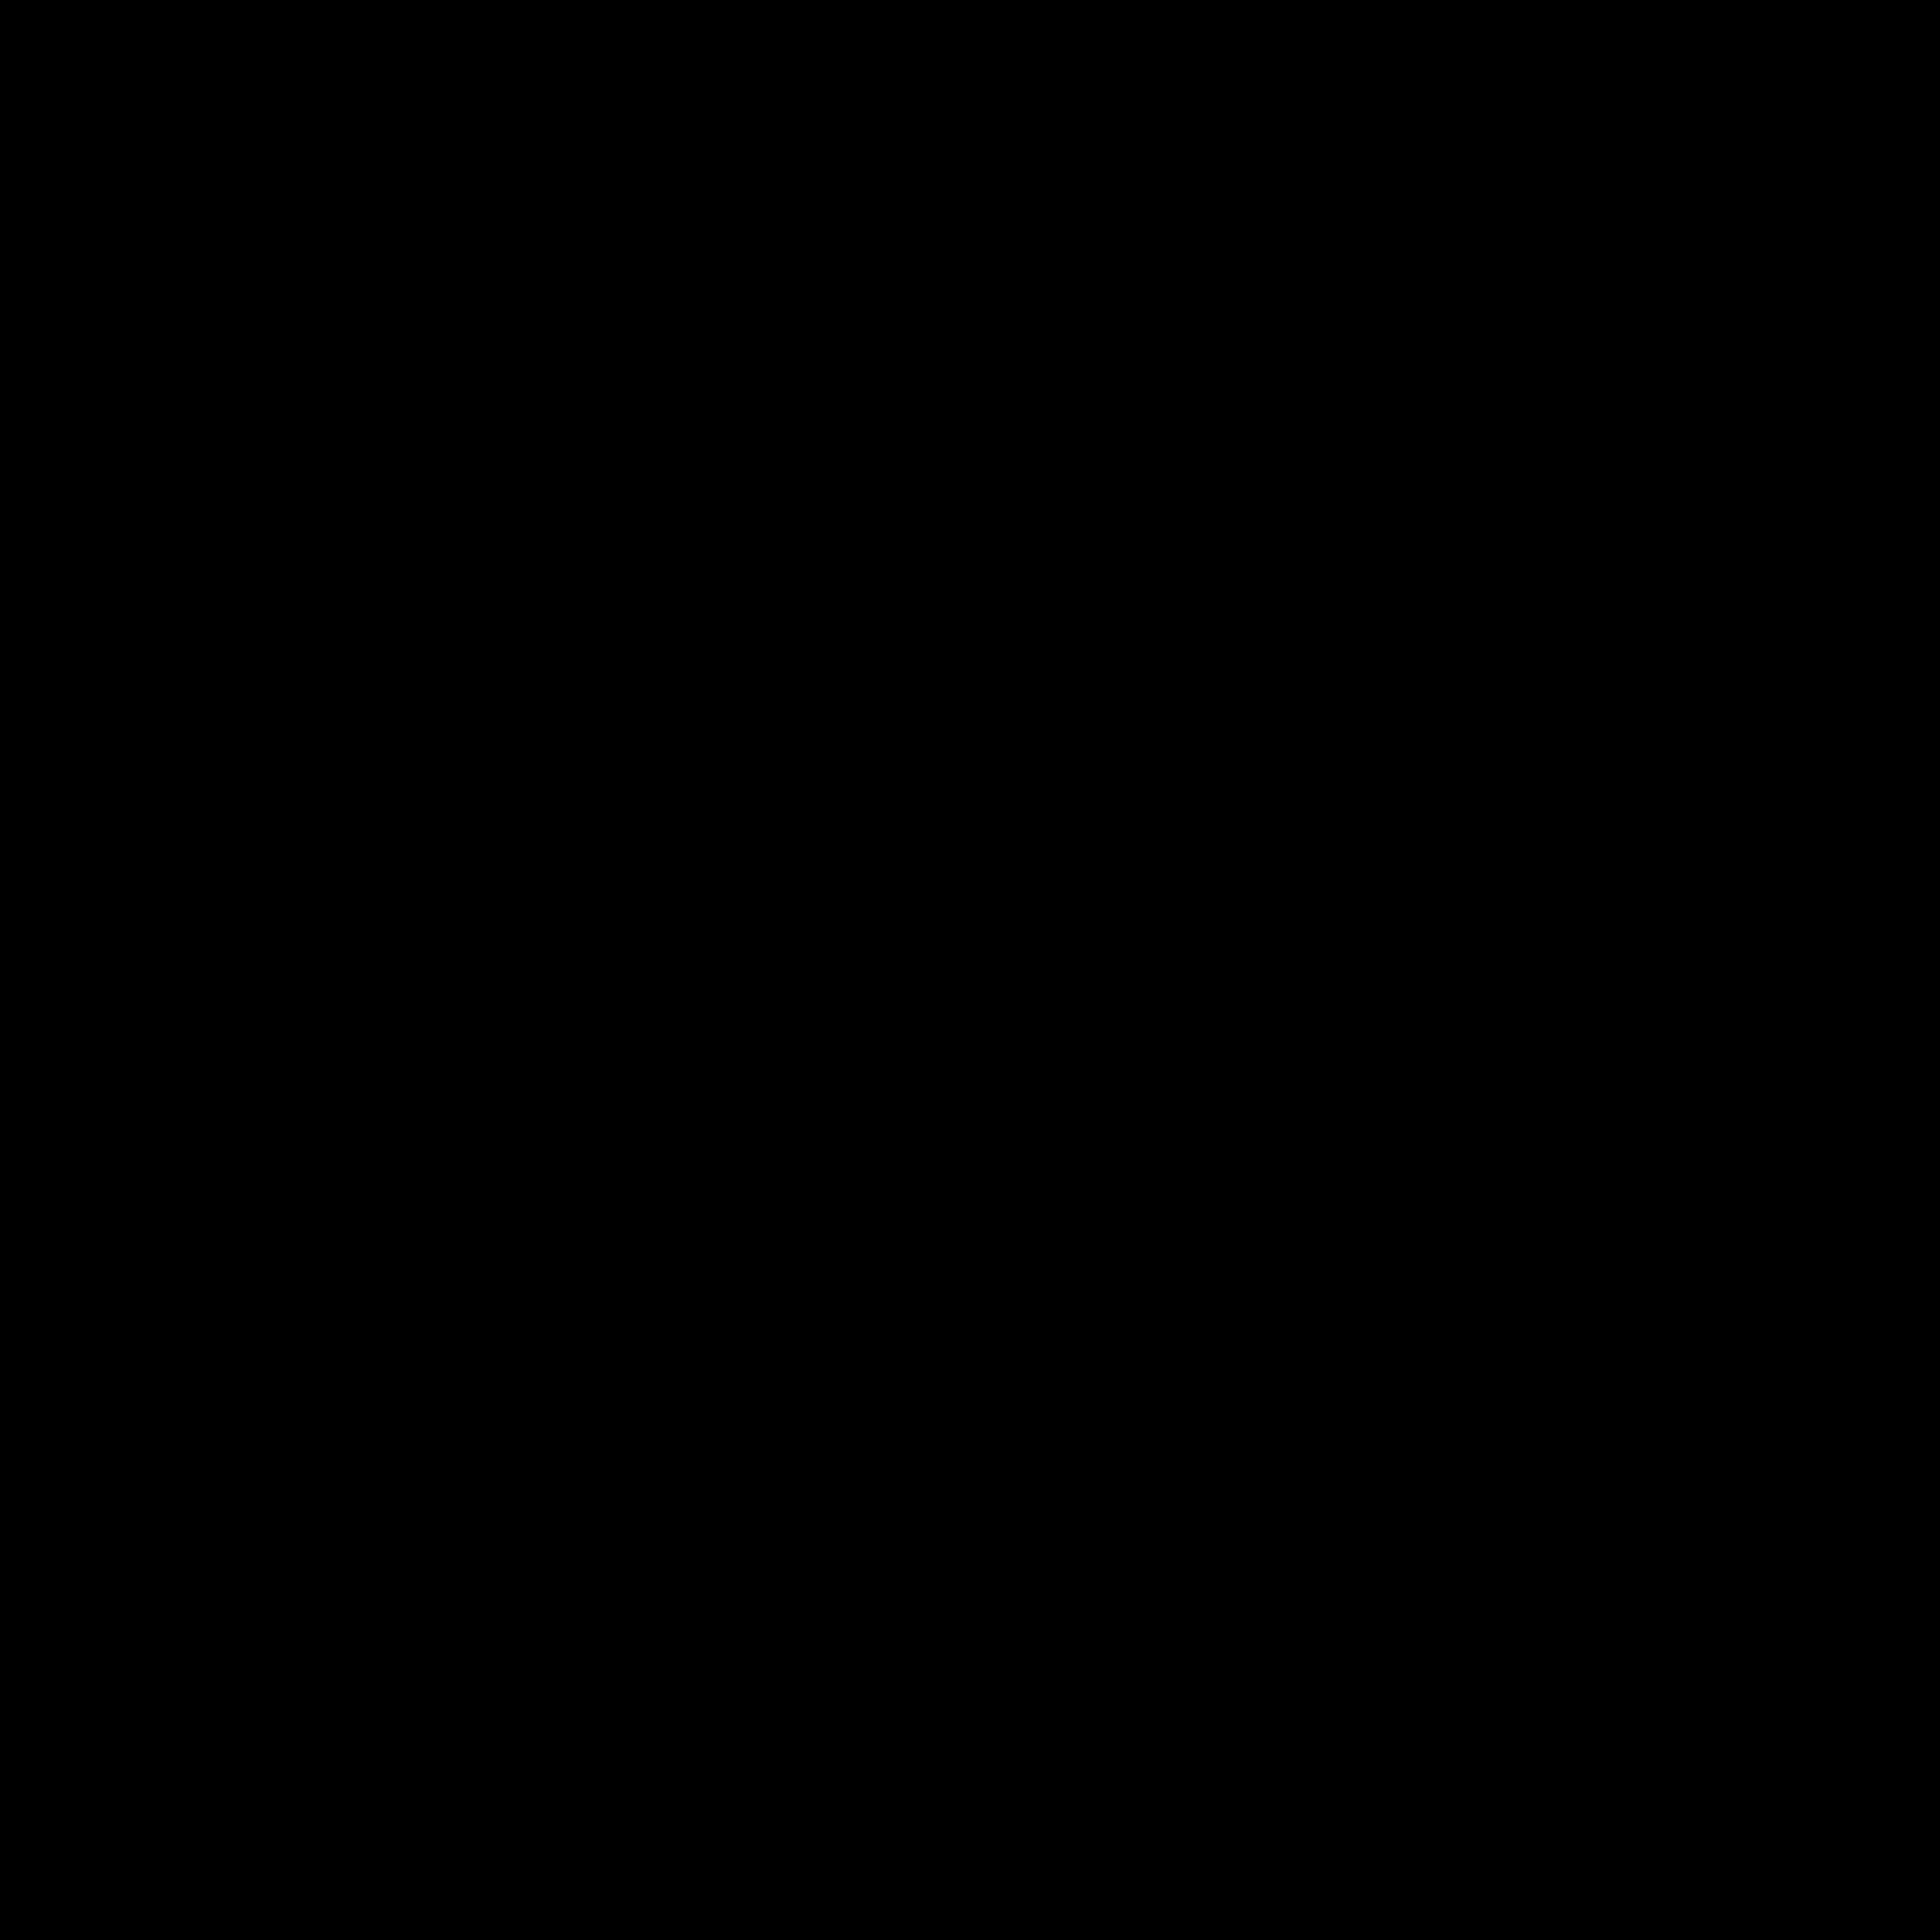 "Sixx:A.M. Presents: Artists for Recovery – neue Radiosingle ""Maybe It's Time"" (feat. Joe Elliott, Brantley Gilbert, Ivan Moody, Slash, Corey Taylor, AWOLNATION, Tommy Vext) (VÖ 21.08.2020)"